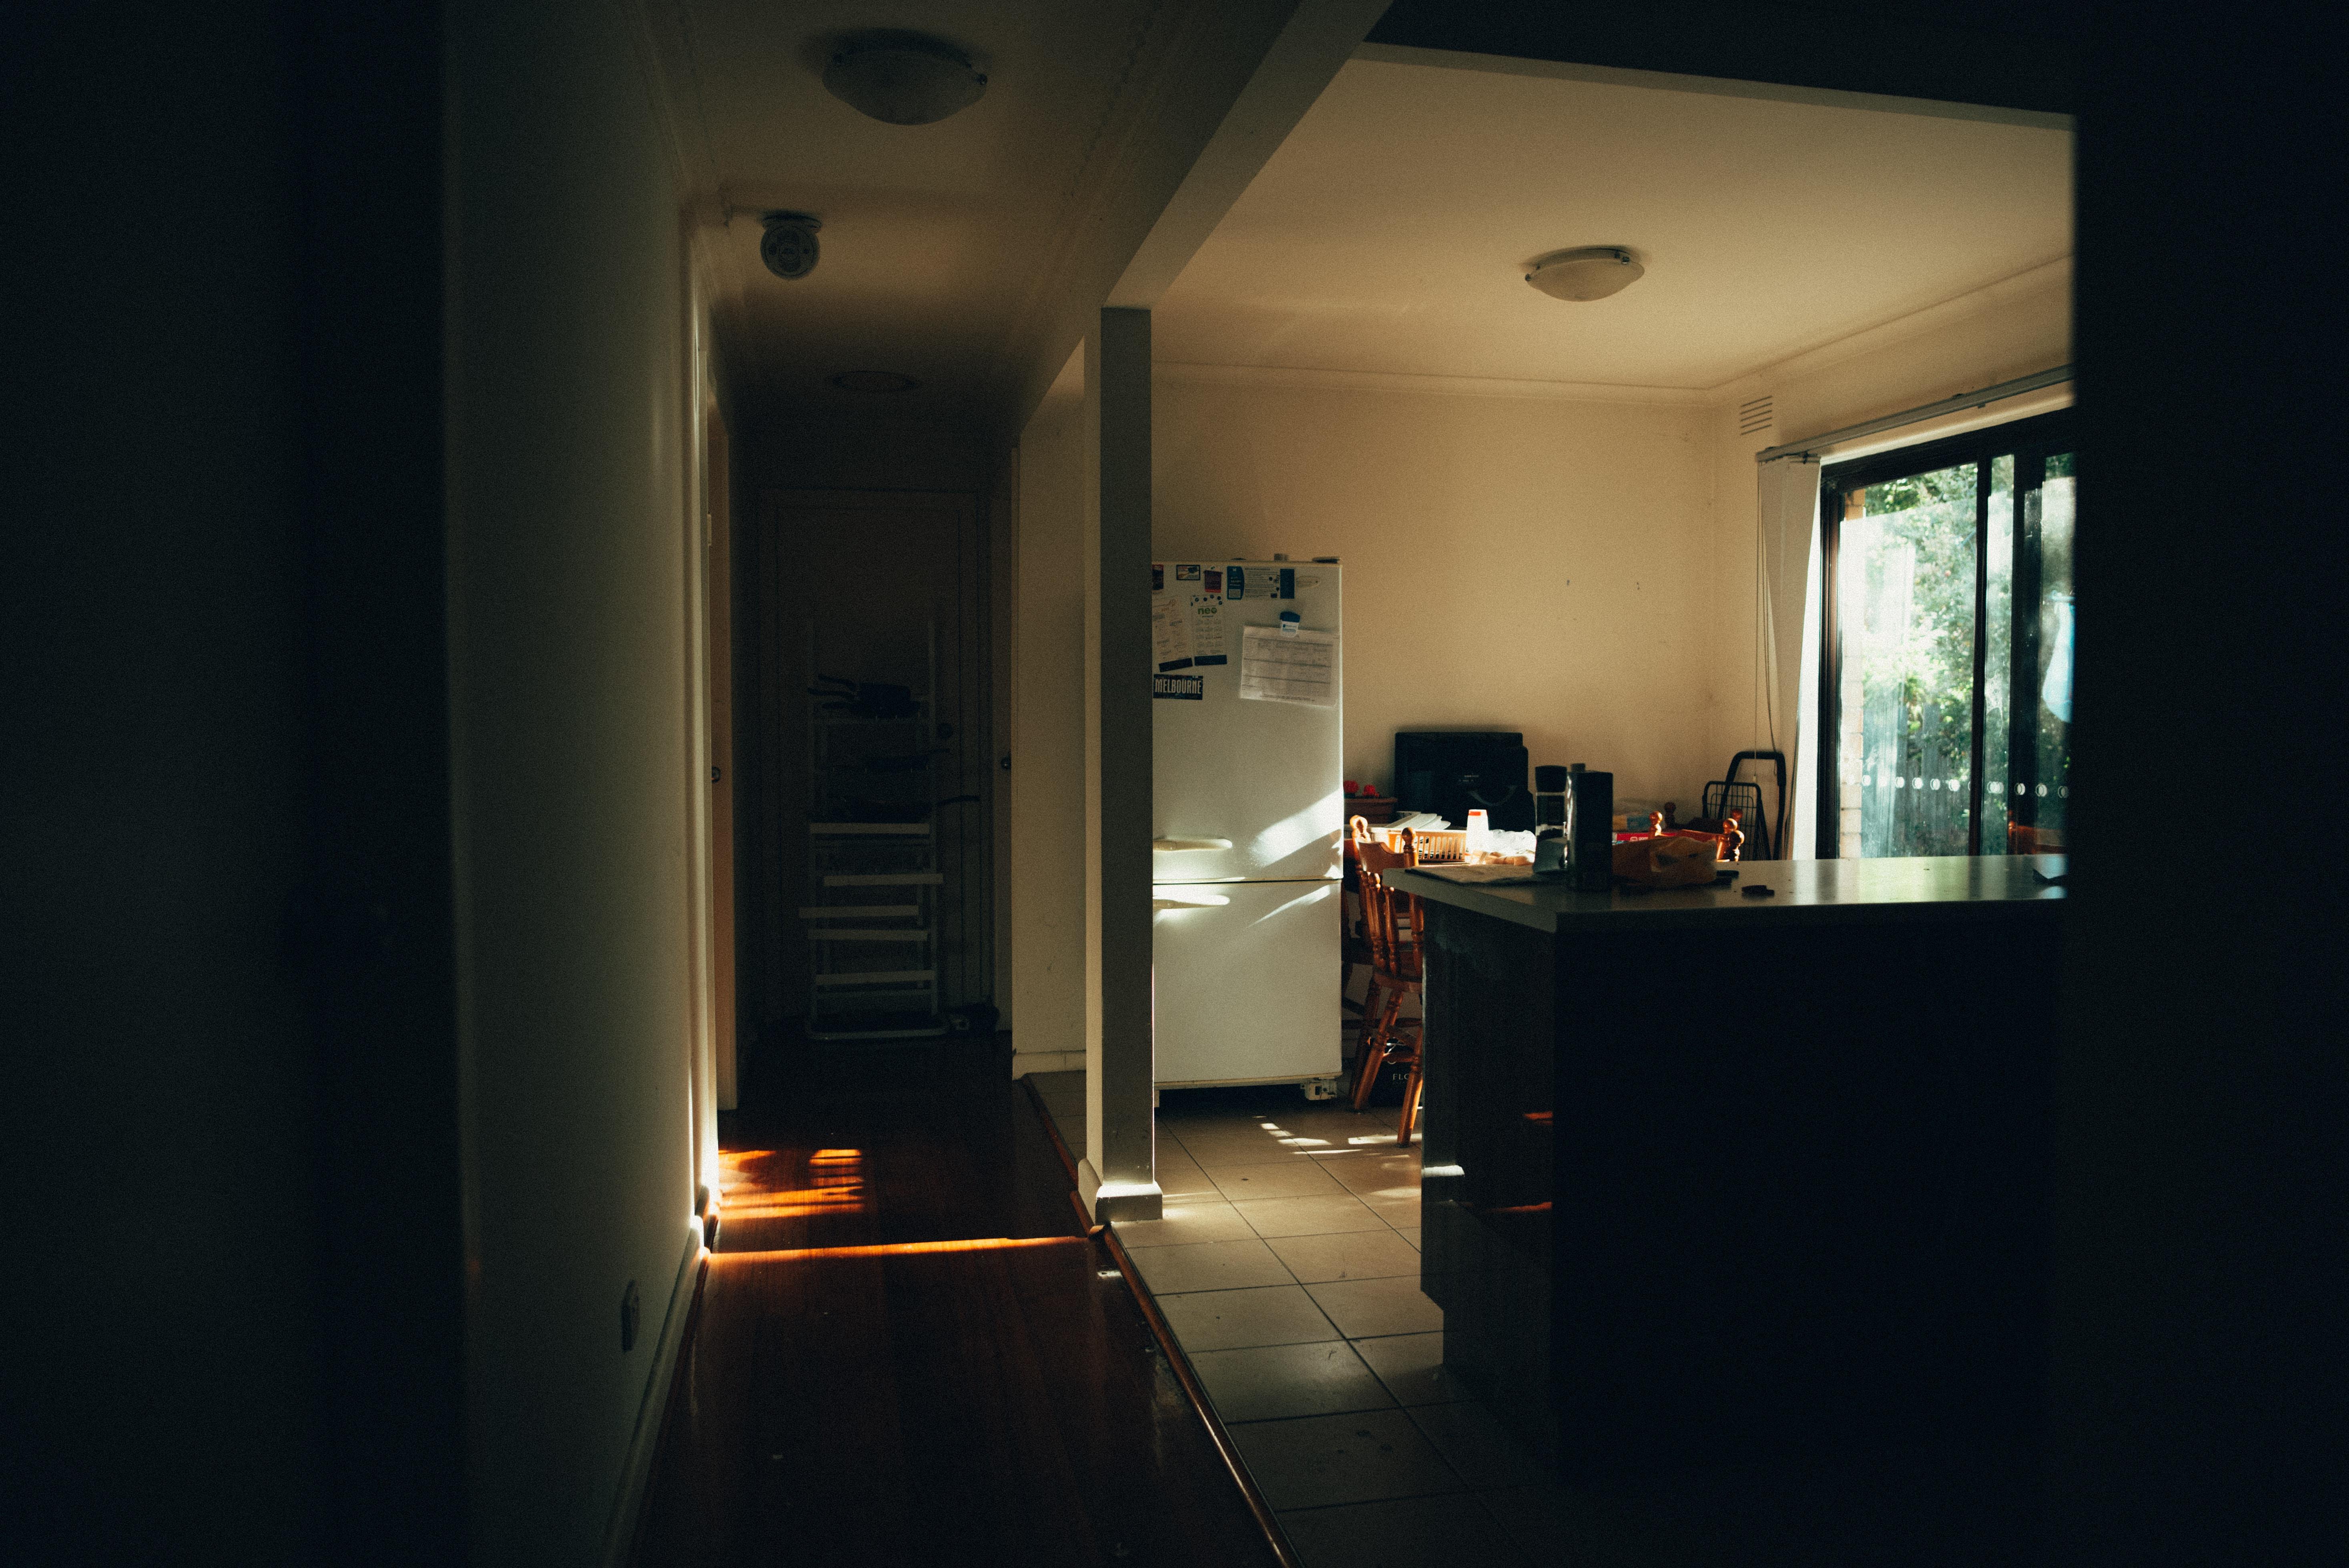 white bottom-mount refrigerator near window inside house